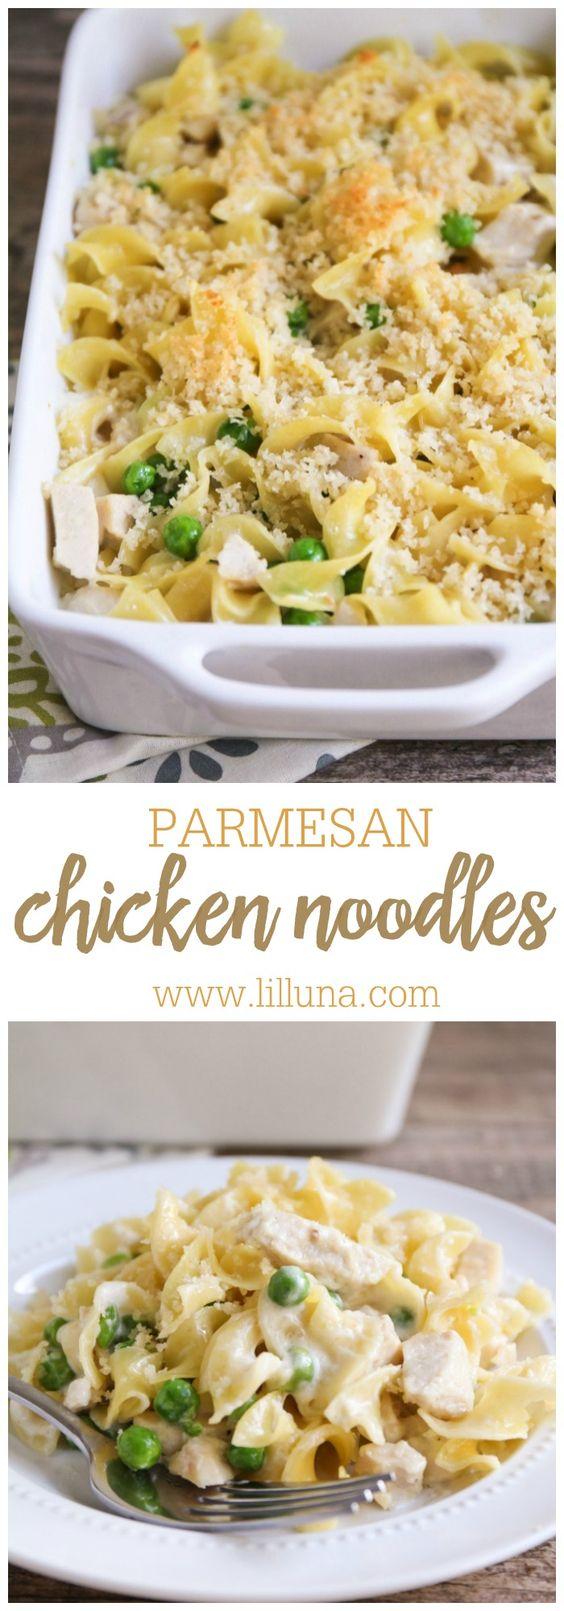 Garlic Parmesan Chicken and Noodles recipe { lilluna.com } So delicious and recipe includes egg noodles, peas, chicken, panko, and parmesan in a creamy sauce!